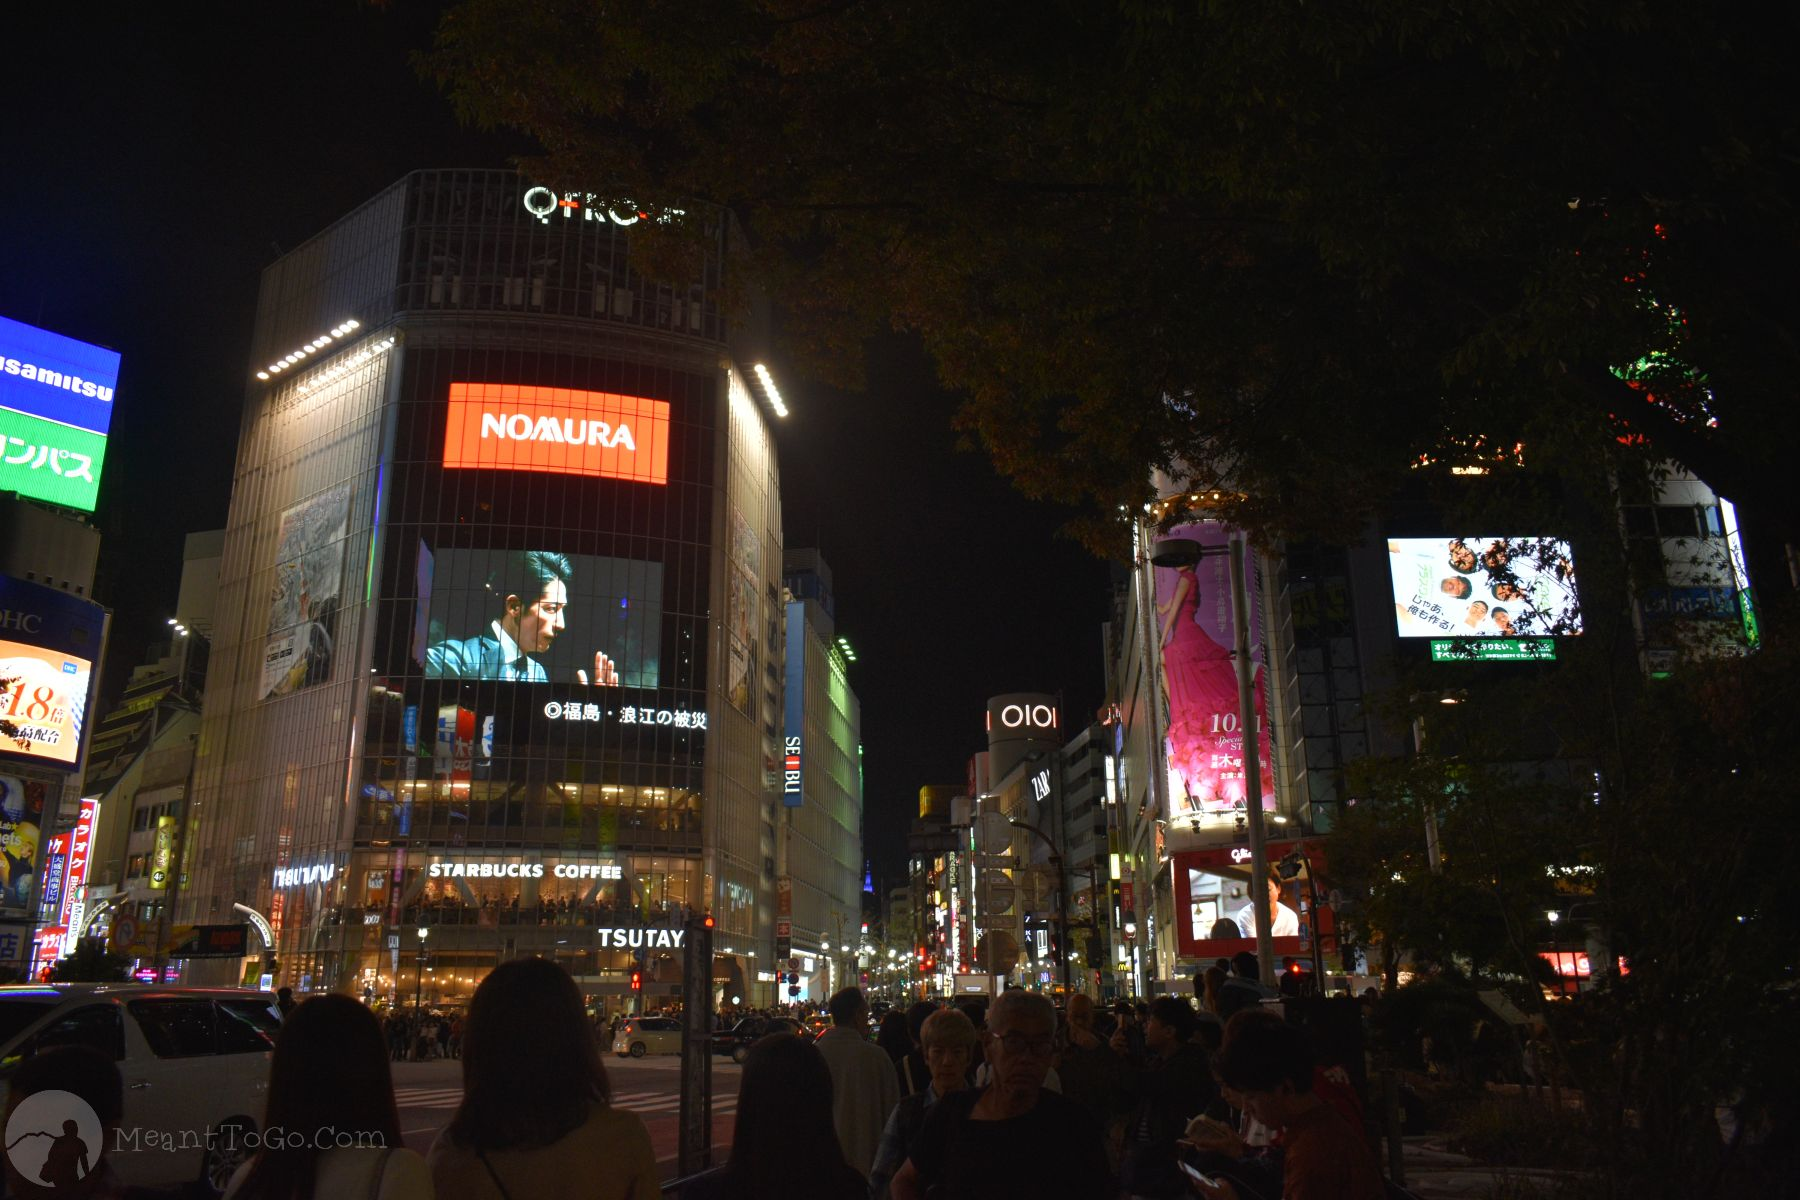 Shibuya Crossing - Shibuya, Tokyo, Japan